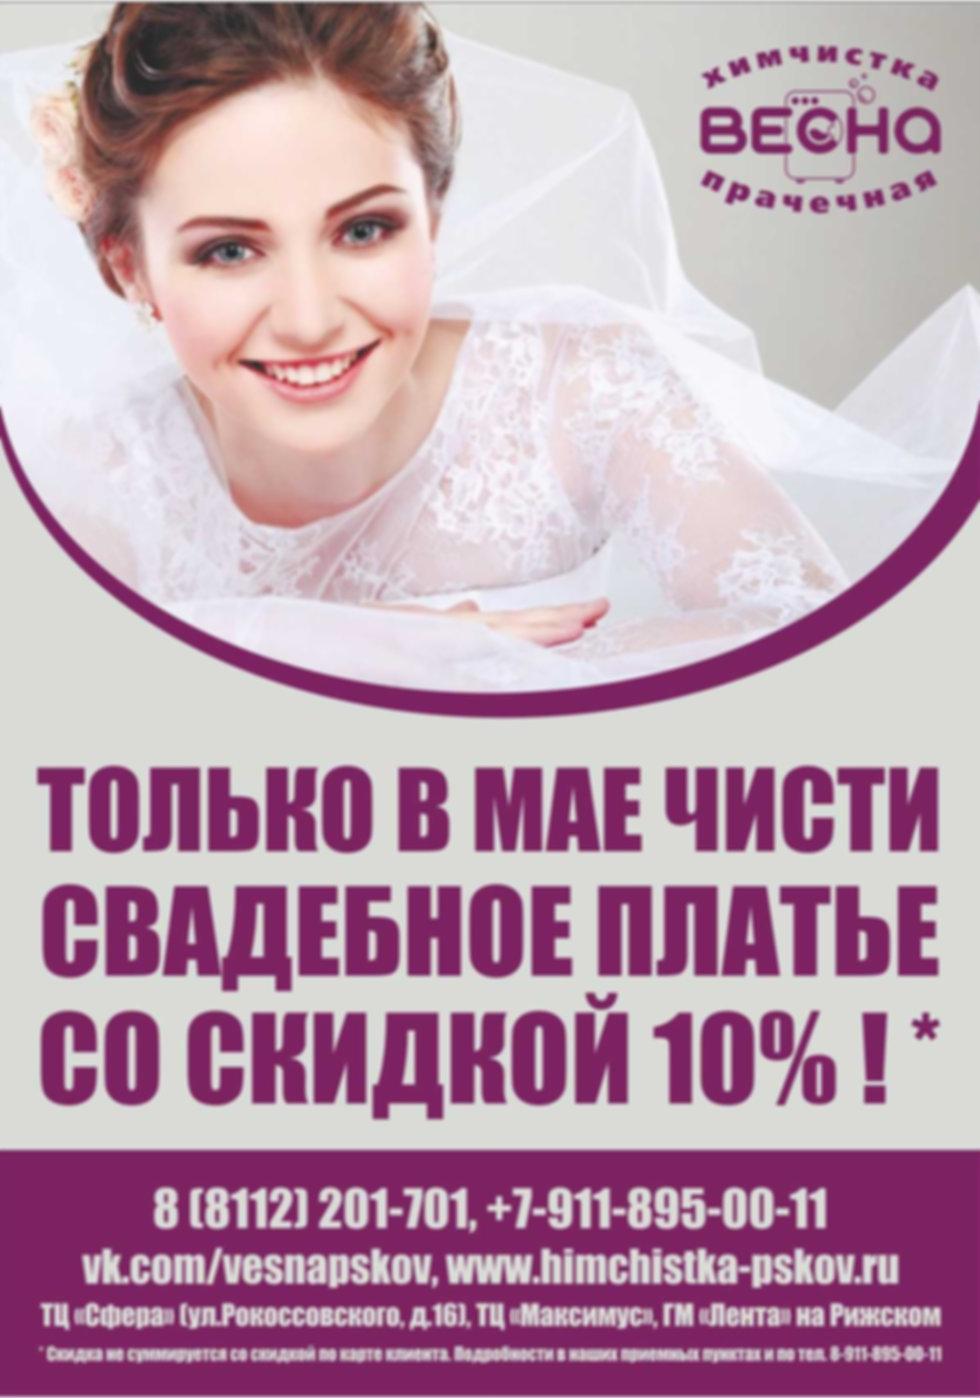 Афиша свадебные платья май 2019.jpg